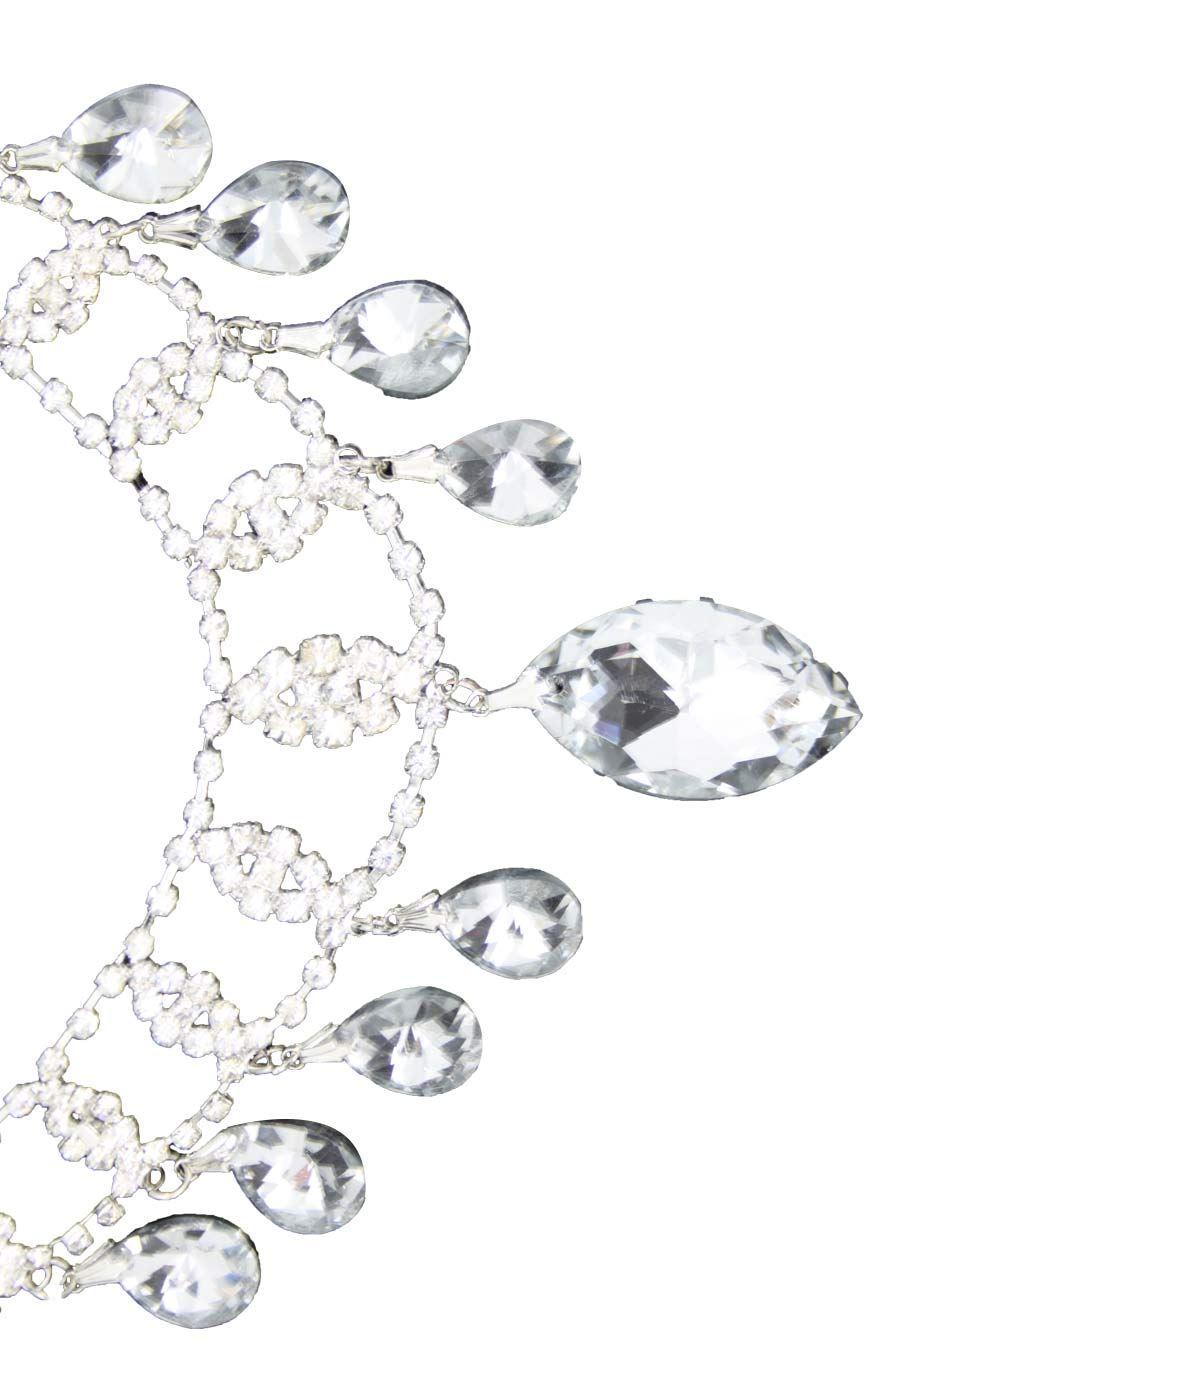 True-Face-Ladies-Women-039-s-Elegant-Earrings-Necklace-Set-Metal-Alloy-Jewellery thumbnail 7